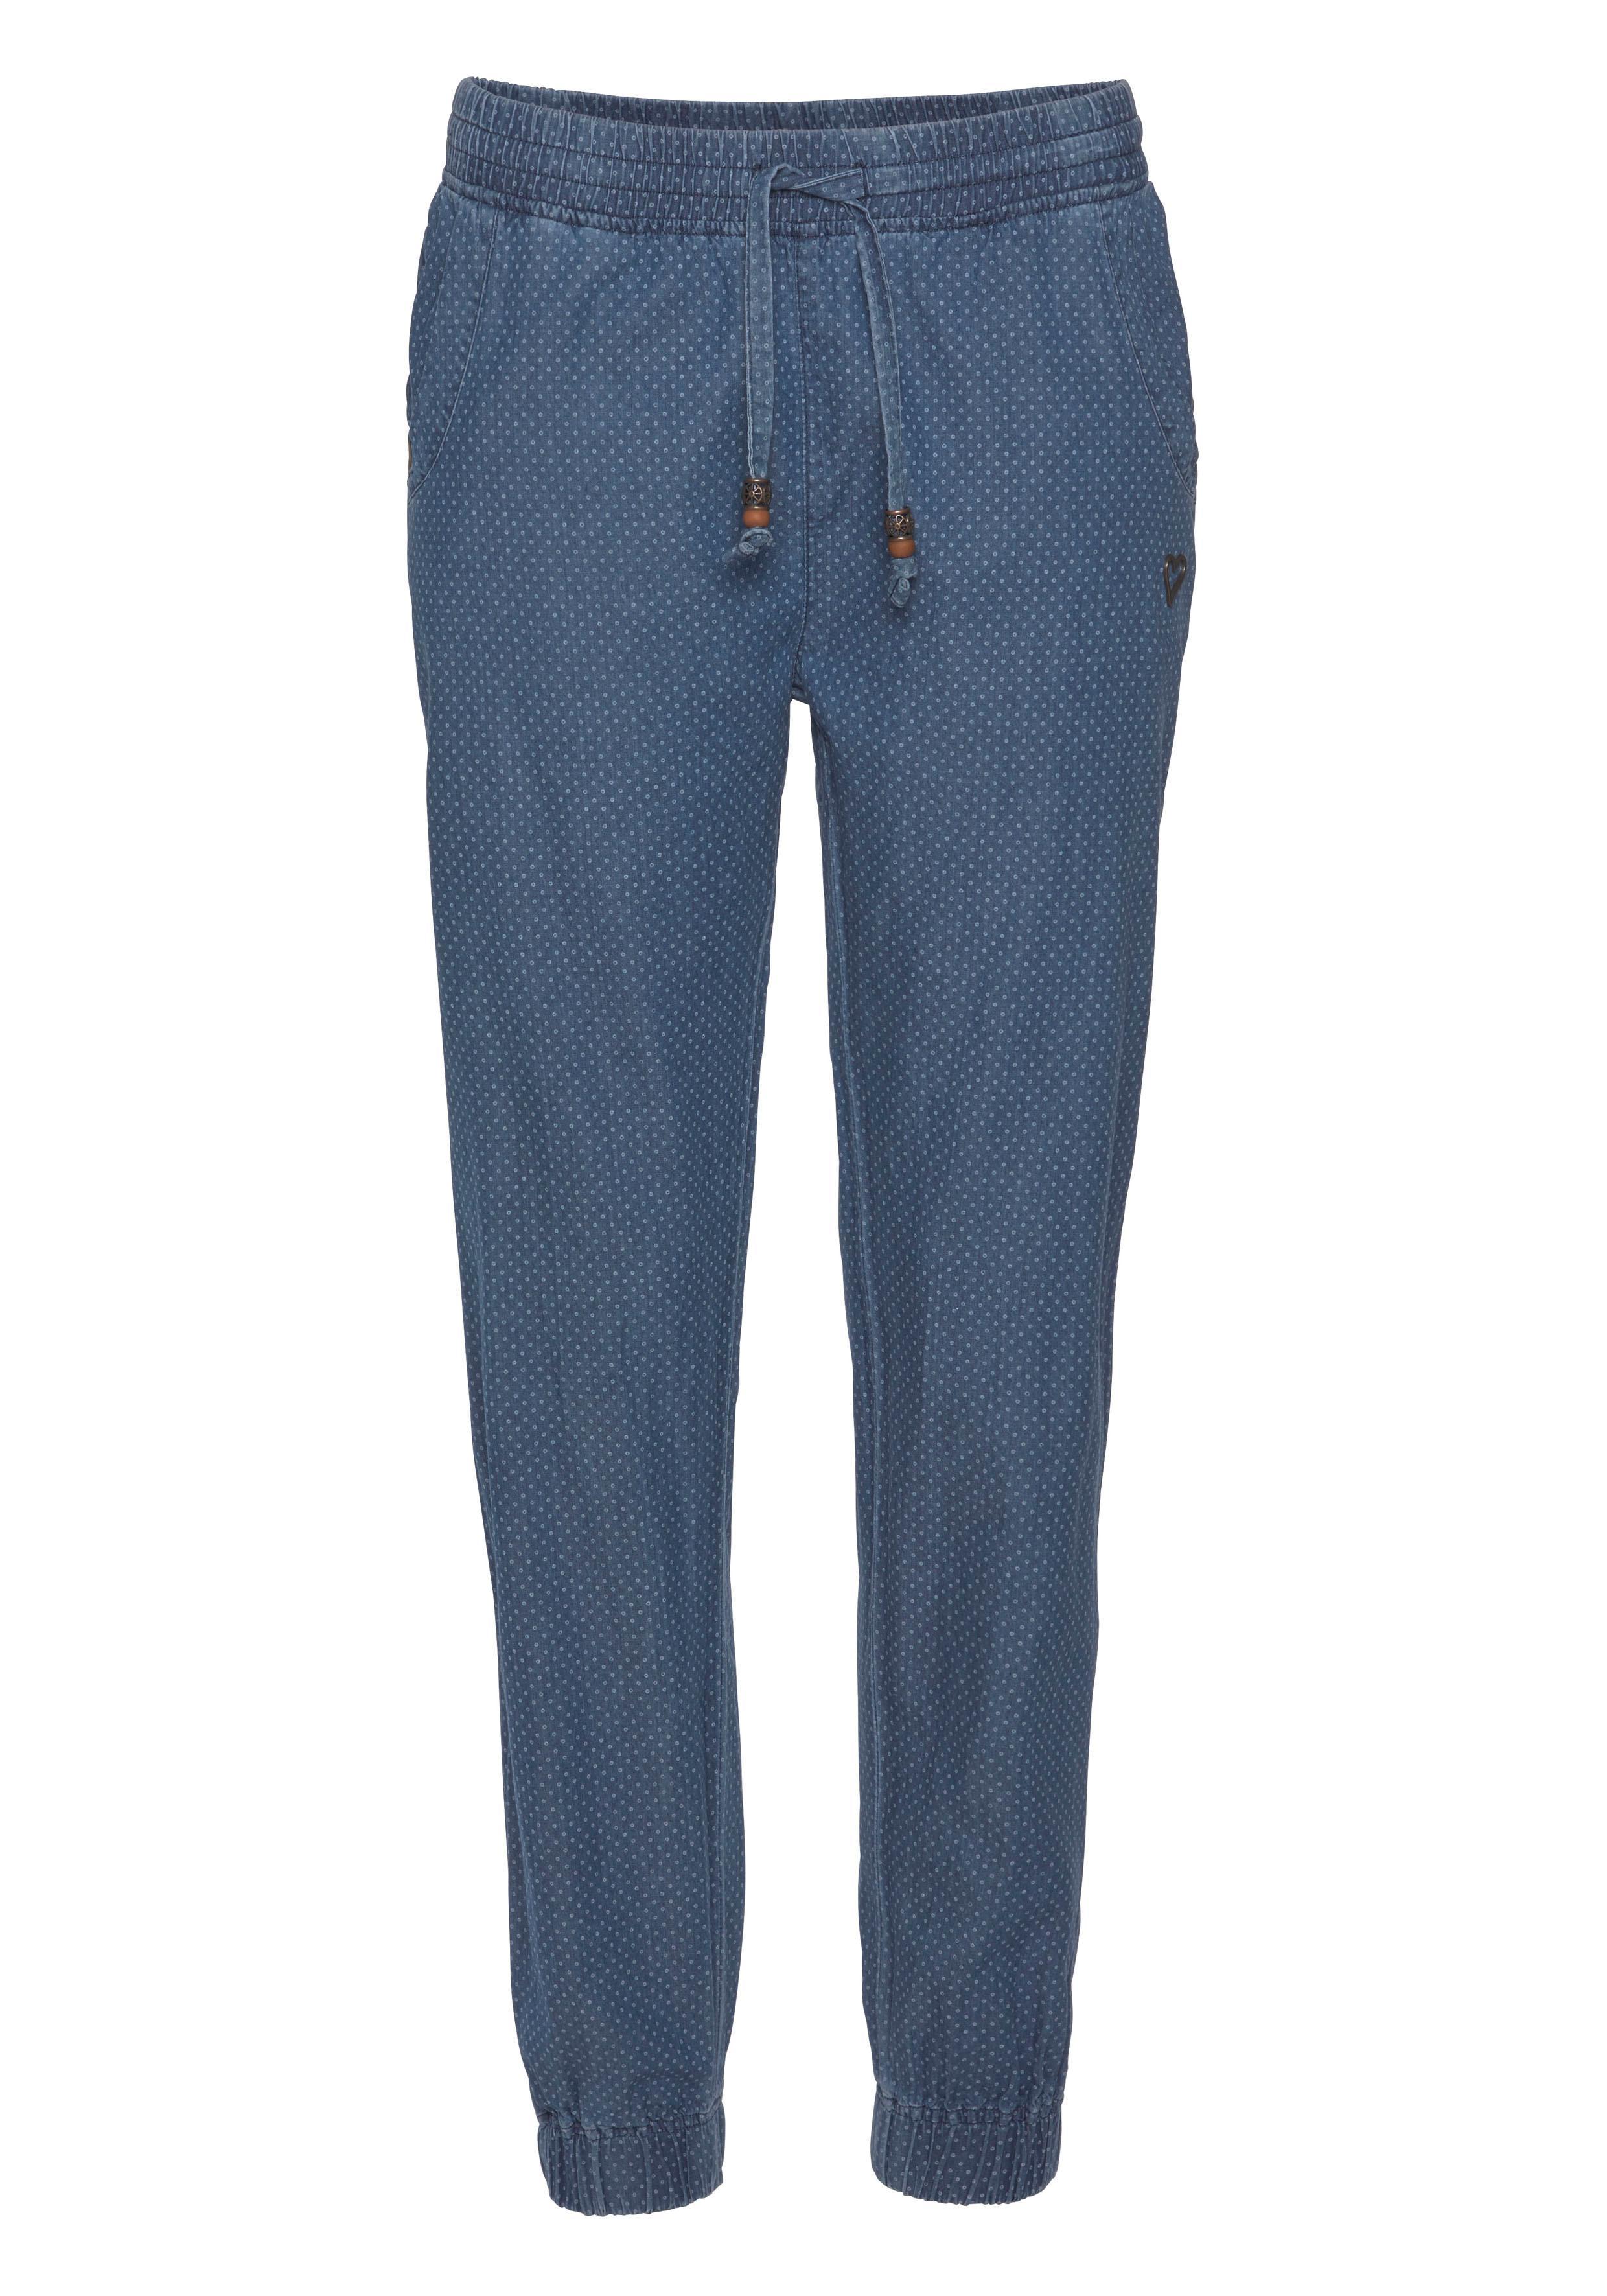 Alife & Kickin Jogger Pants »AliciaAK C« in Jeans-Optik mit Elasthan günstig online kaufen